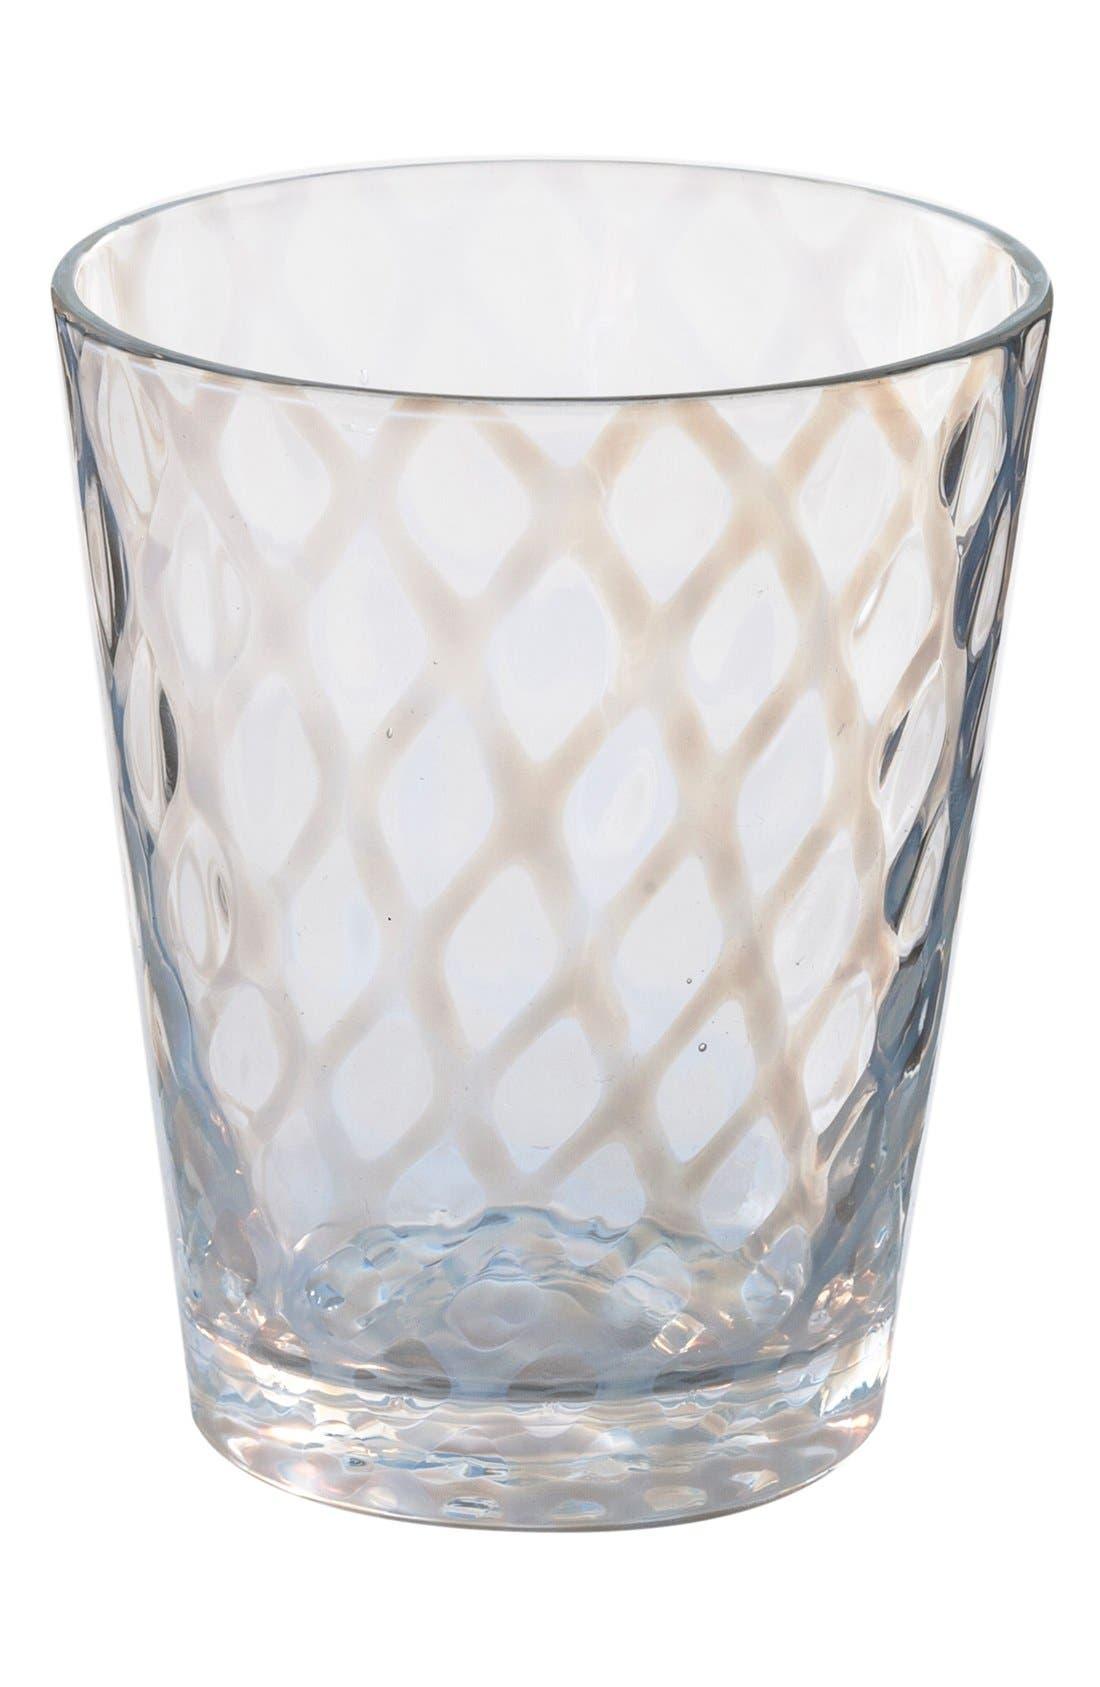 Alternate Image 1 Selected - Rosanna 'Lattice' Double Old Fashioned Glasses (Set of 4)